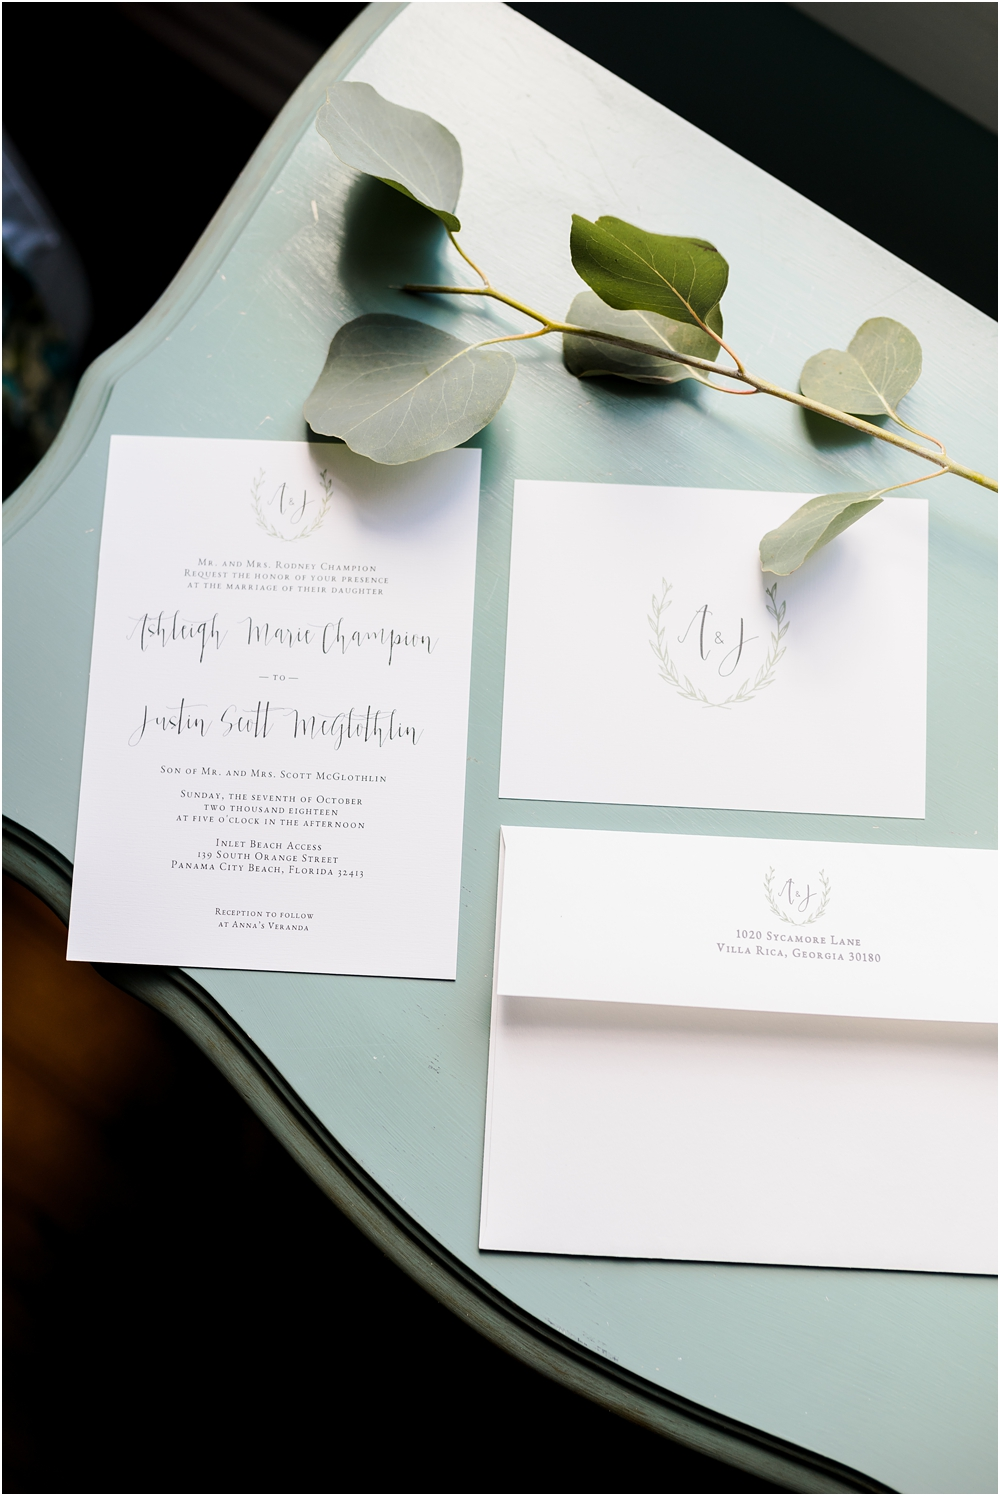 mcglothlin-wedding-kiersten-stevenson-photography-30a-panama-city-beach-dothan-tallahassee-(3-of-145).jpg